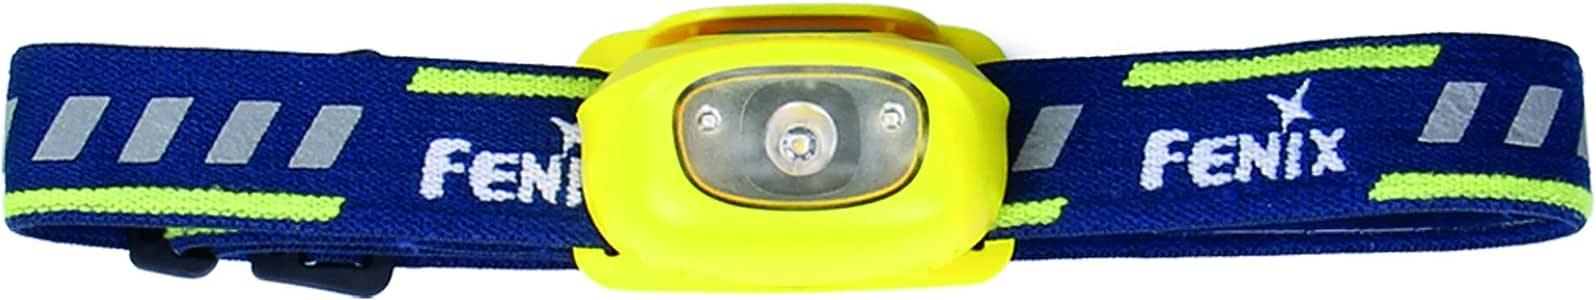 FENIX Hl16 Childsafe Lampe Frontale Mixte